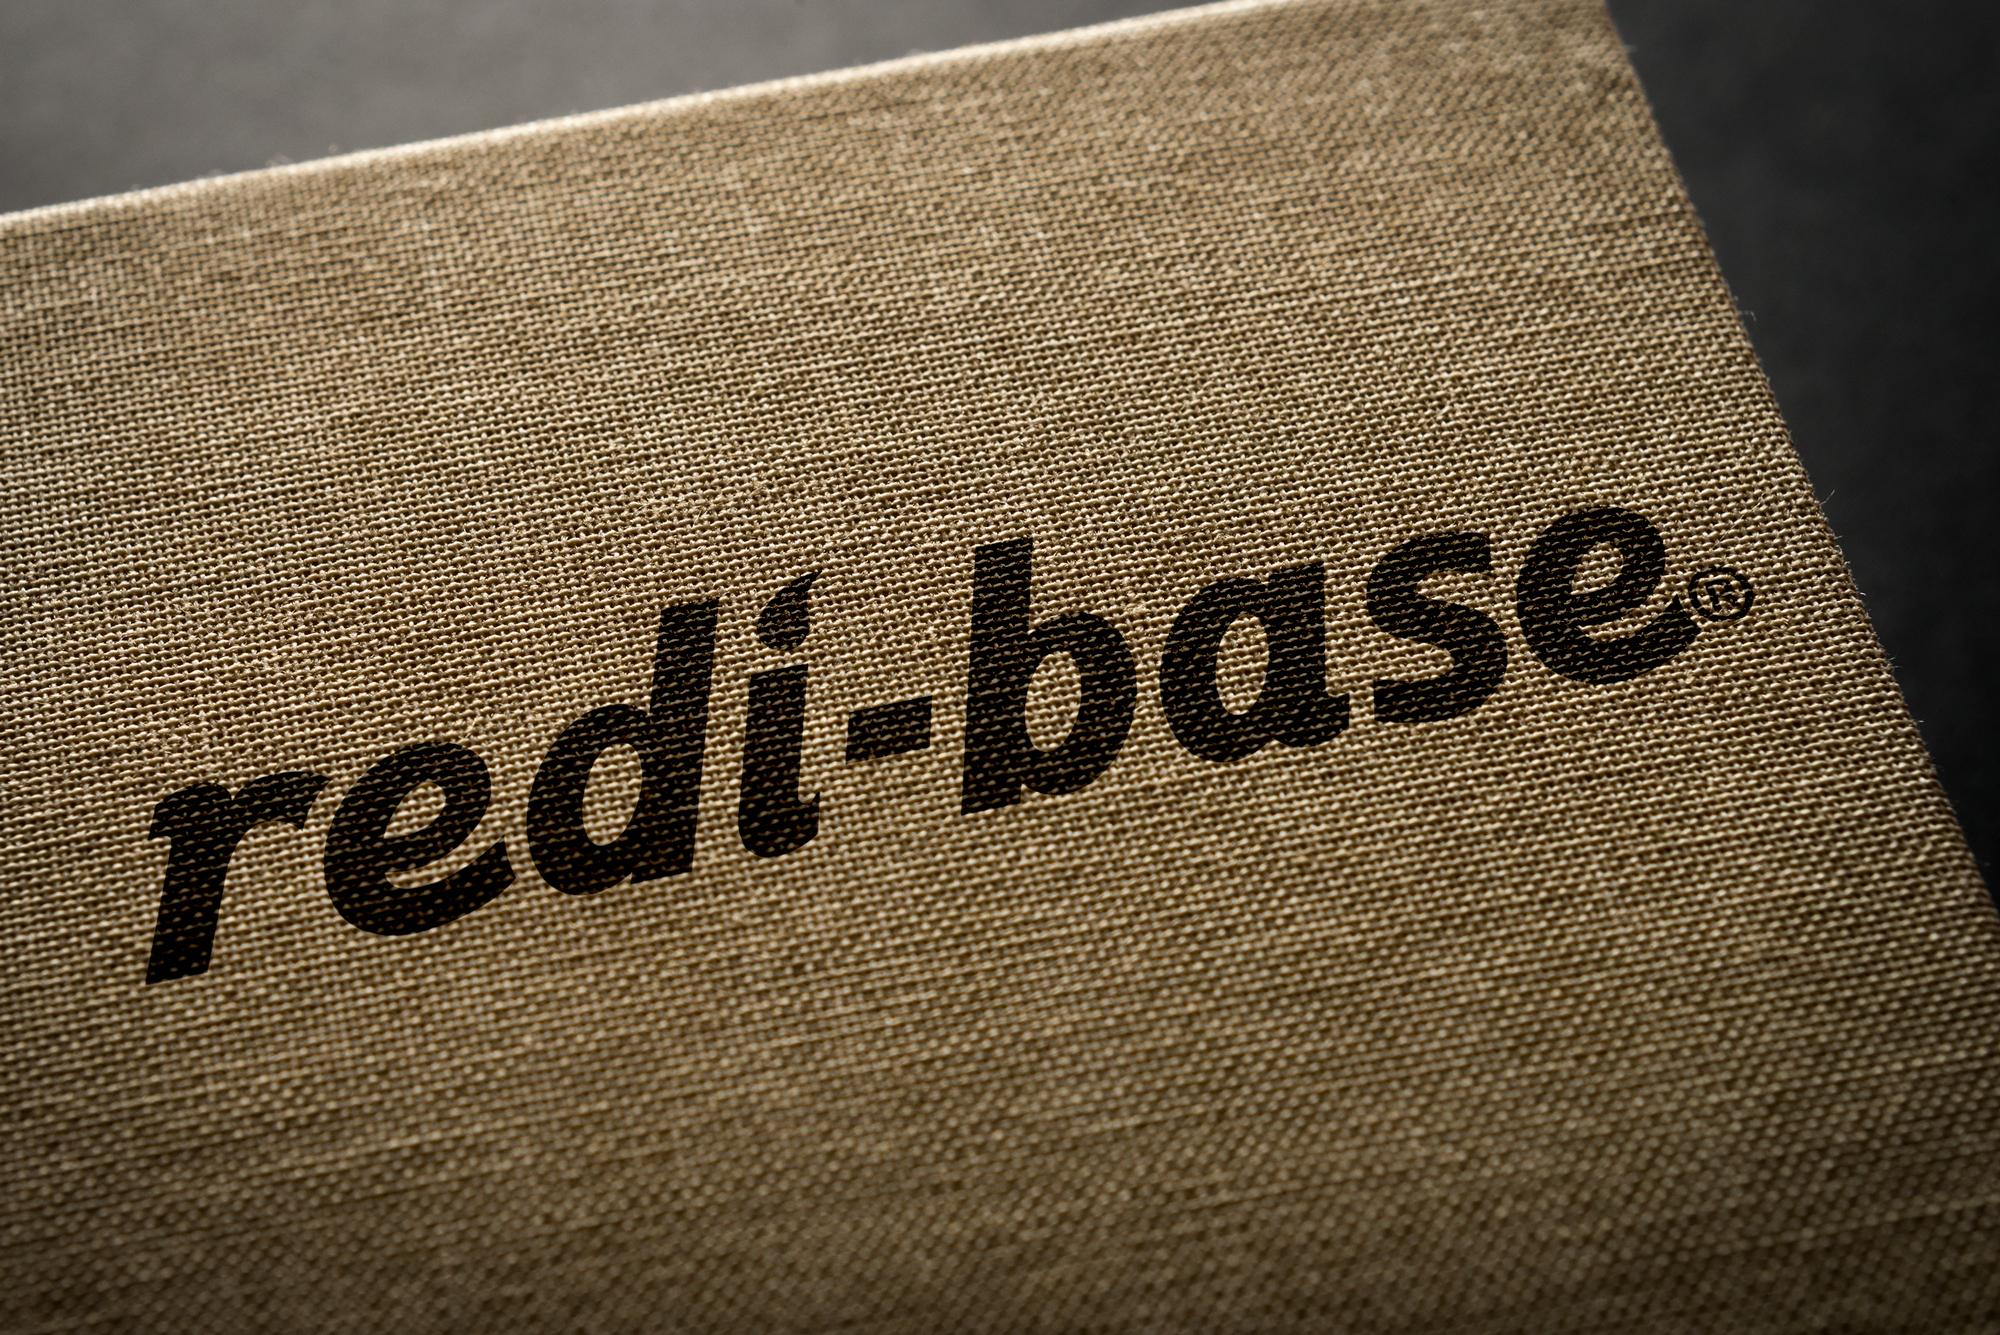 grass-creative-branding-design-product-packaging-logo-NYC-NJ-redibase.jpg